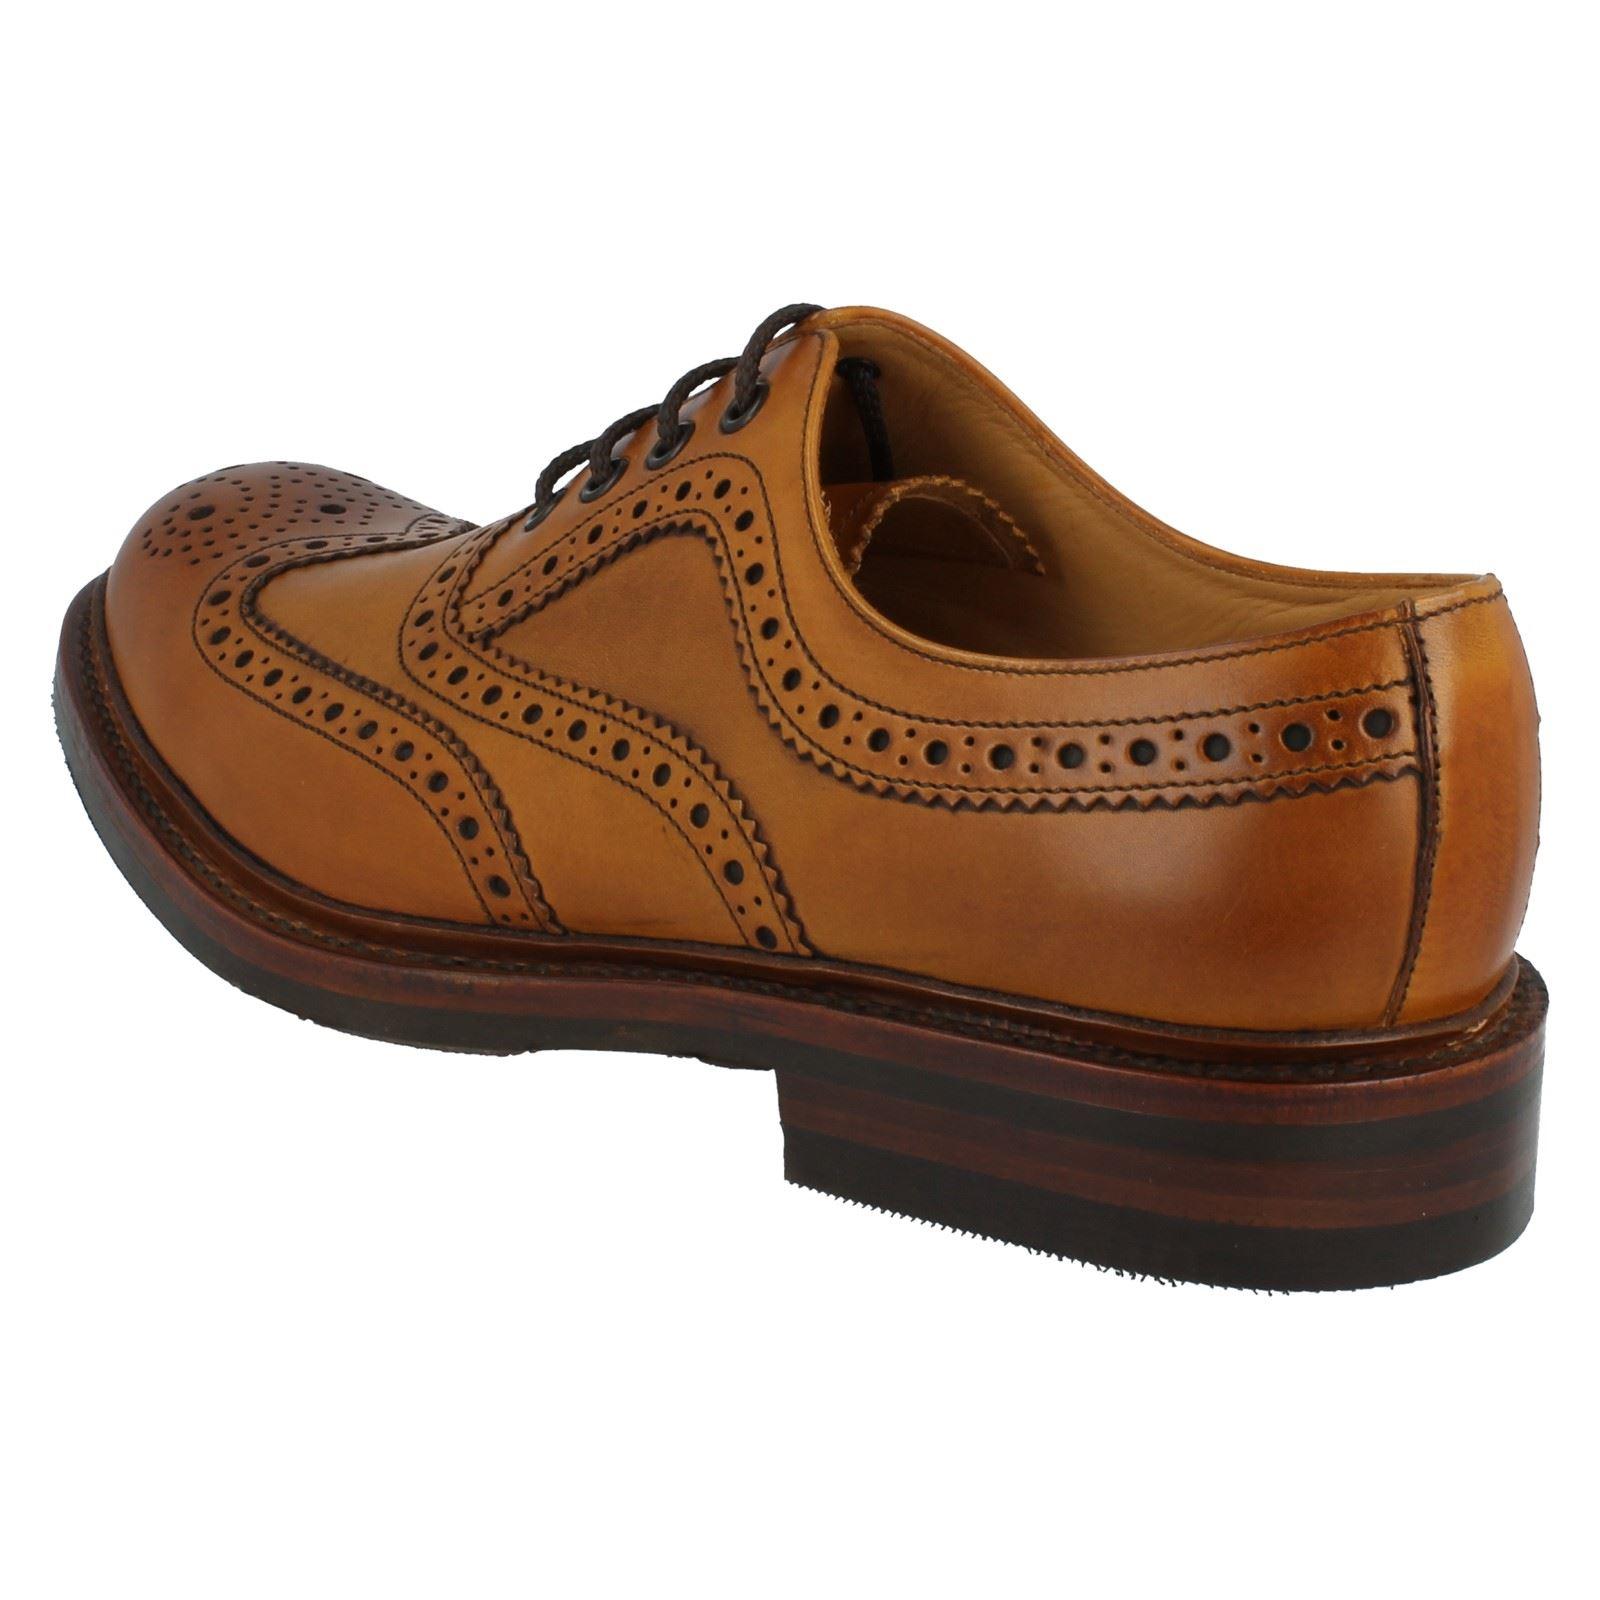 mens loake formal brogue shoes fitting g style edward ebay